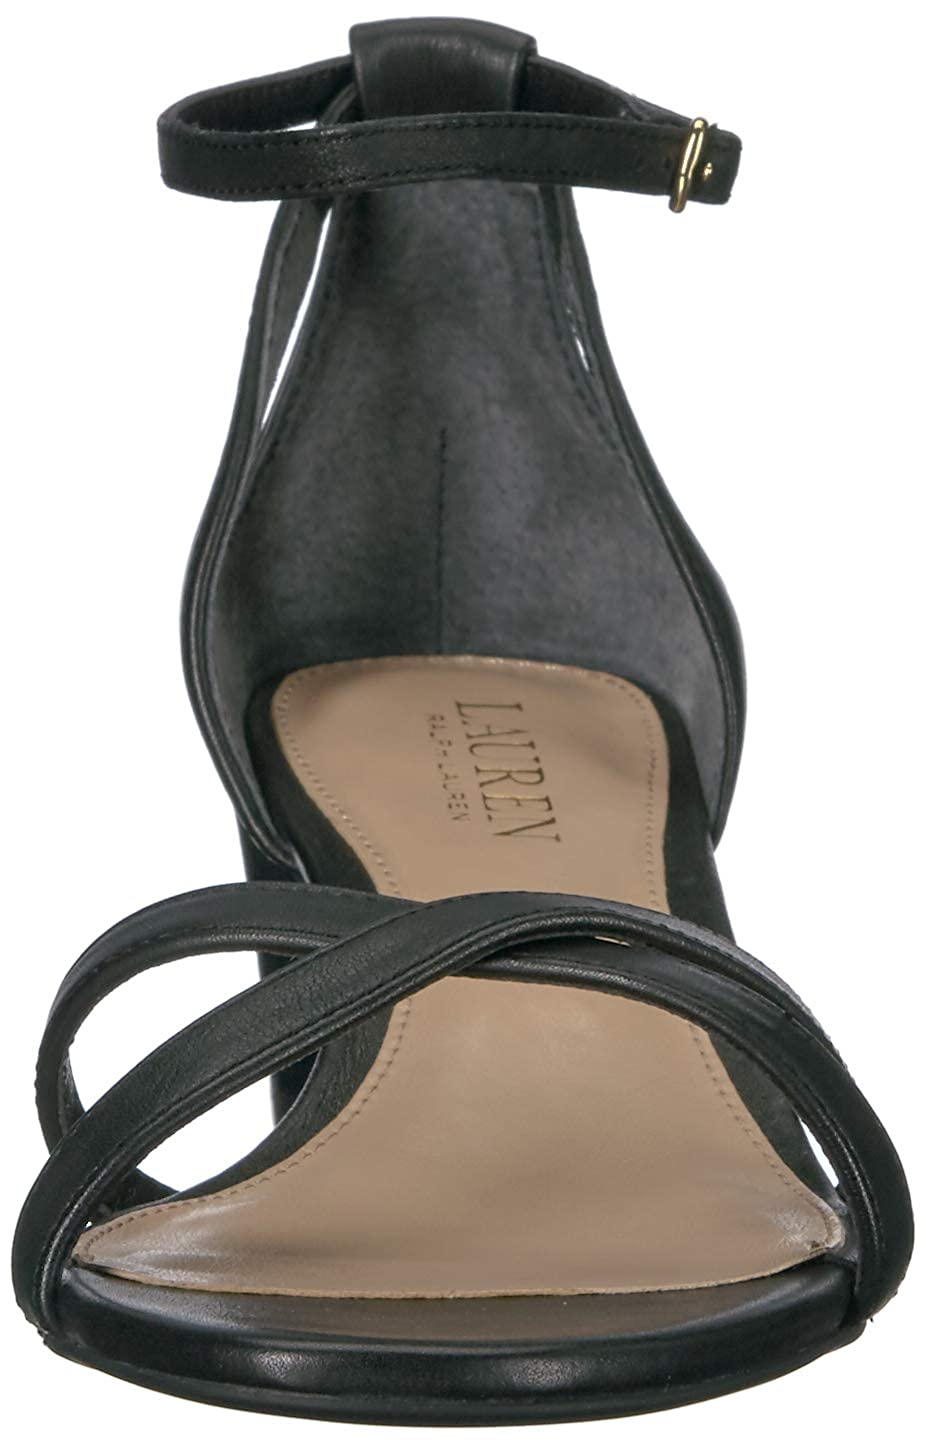 0c5b6ebf7b0 Amazon.com  Lauren Ralph Lauren Women s Folly Sandal  Shoes